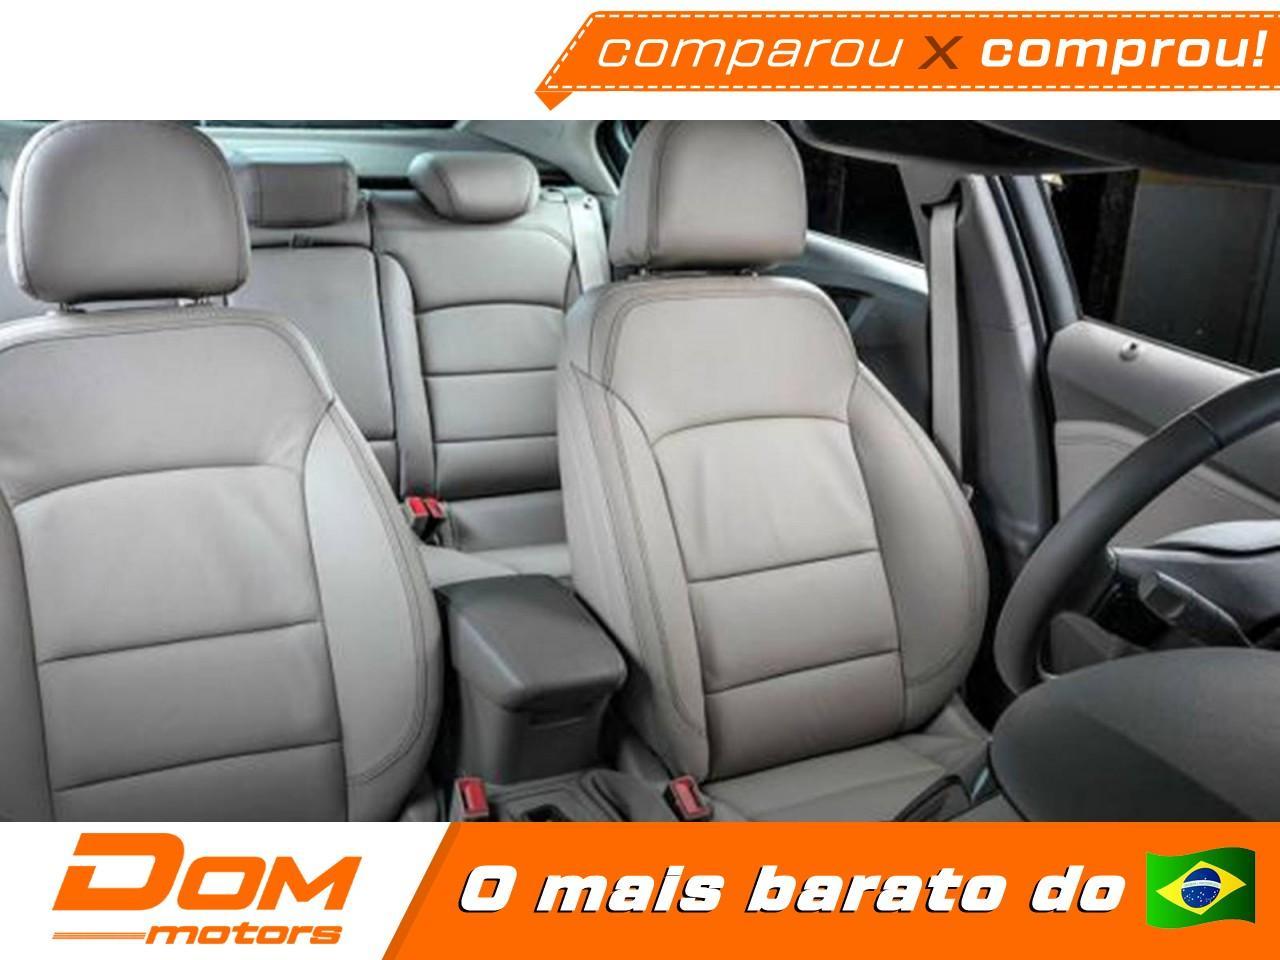 CHEVROLET Cruze Sedan 1.4 16V 4P LTZ FLEX TURBO AUTOMÁTICO, Foto 2